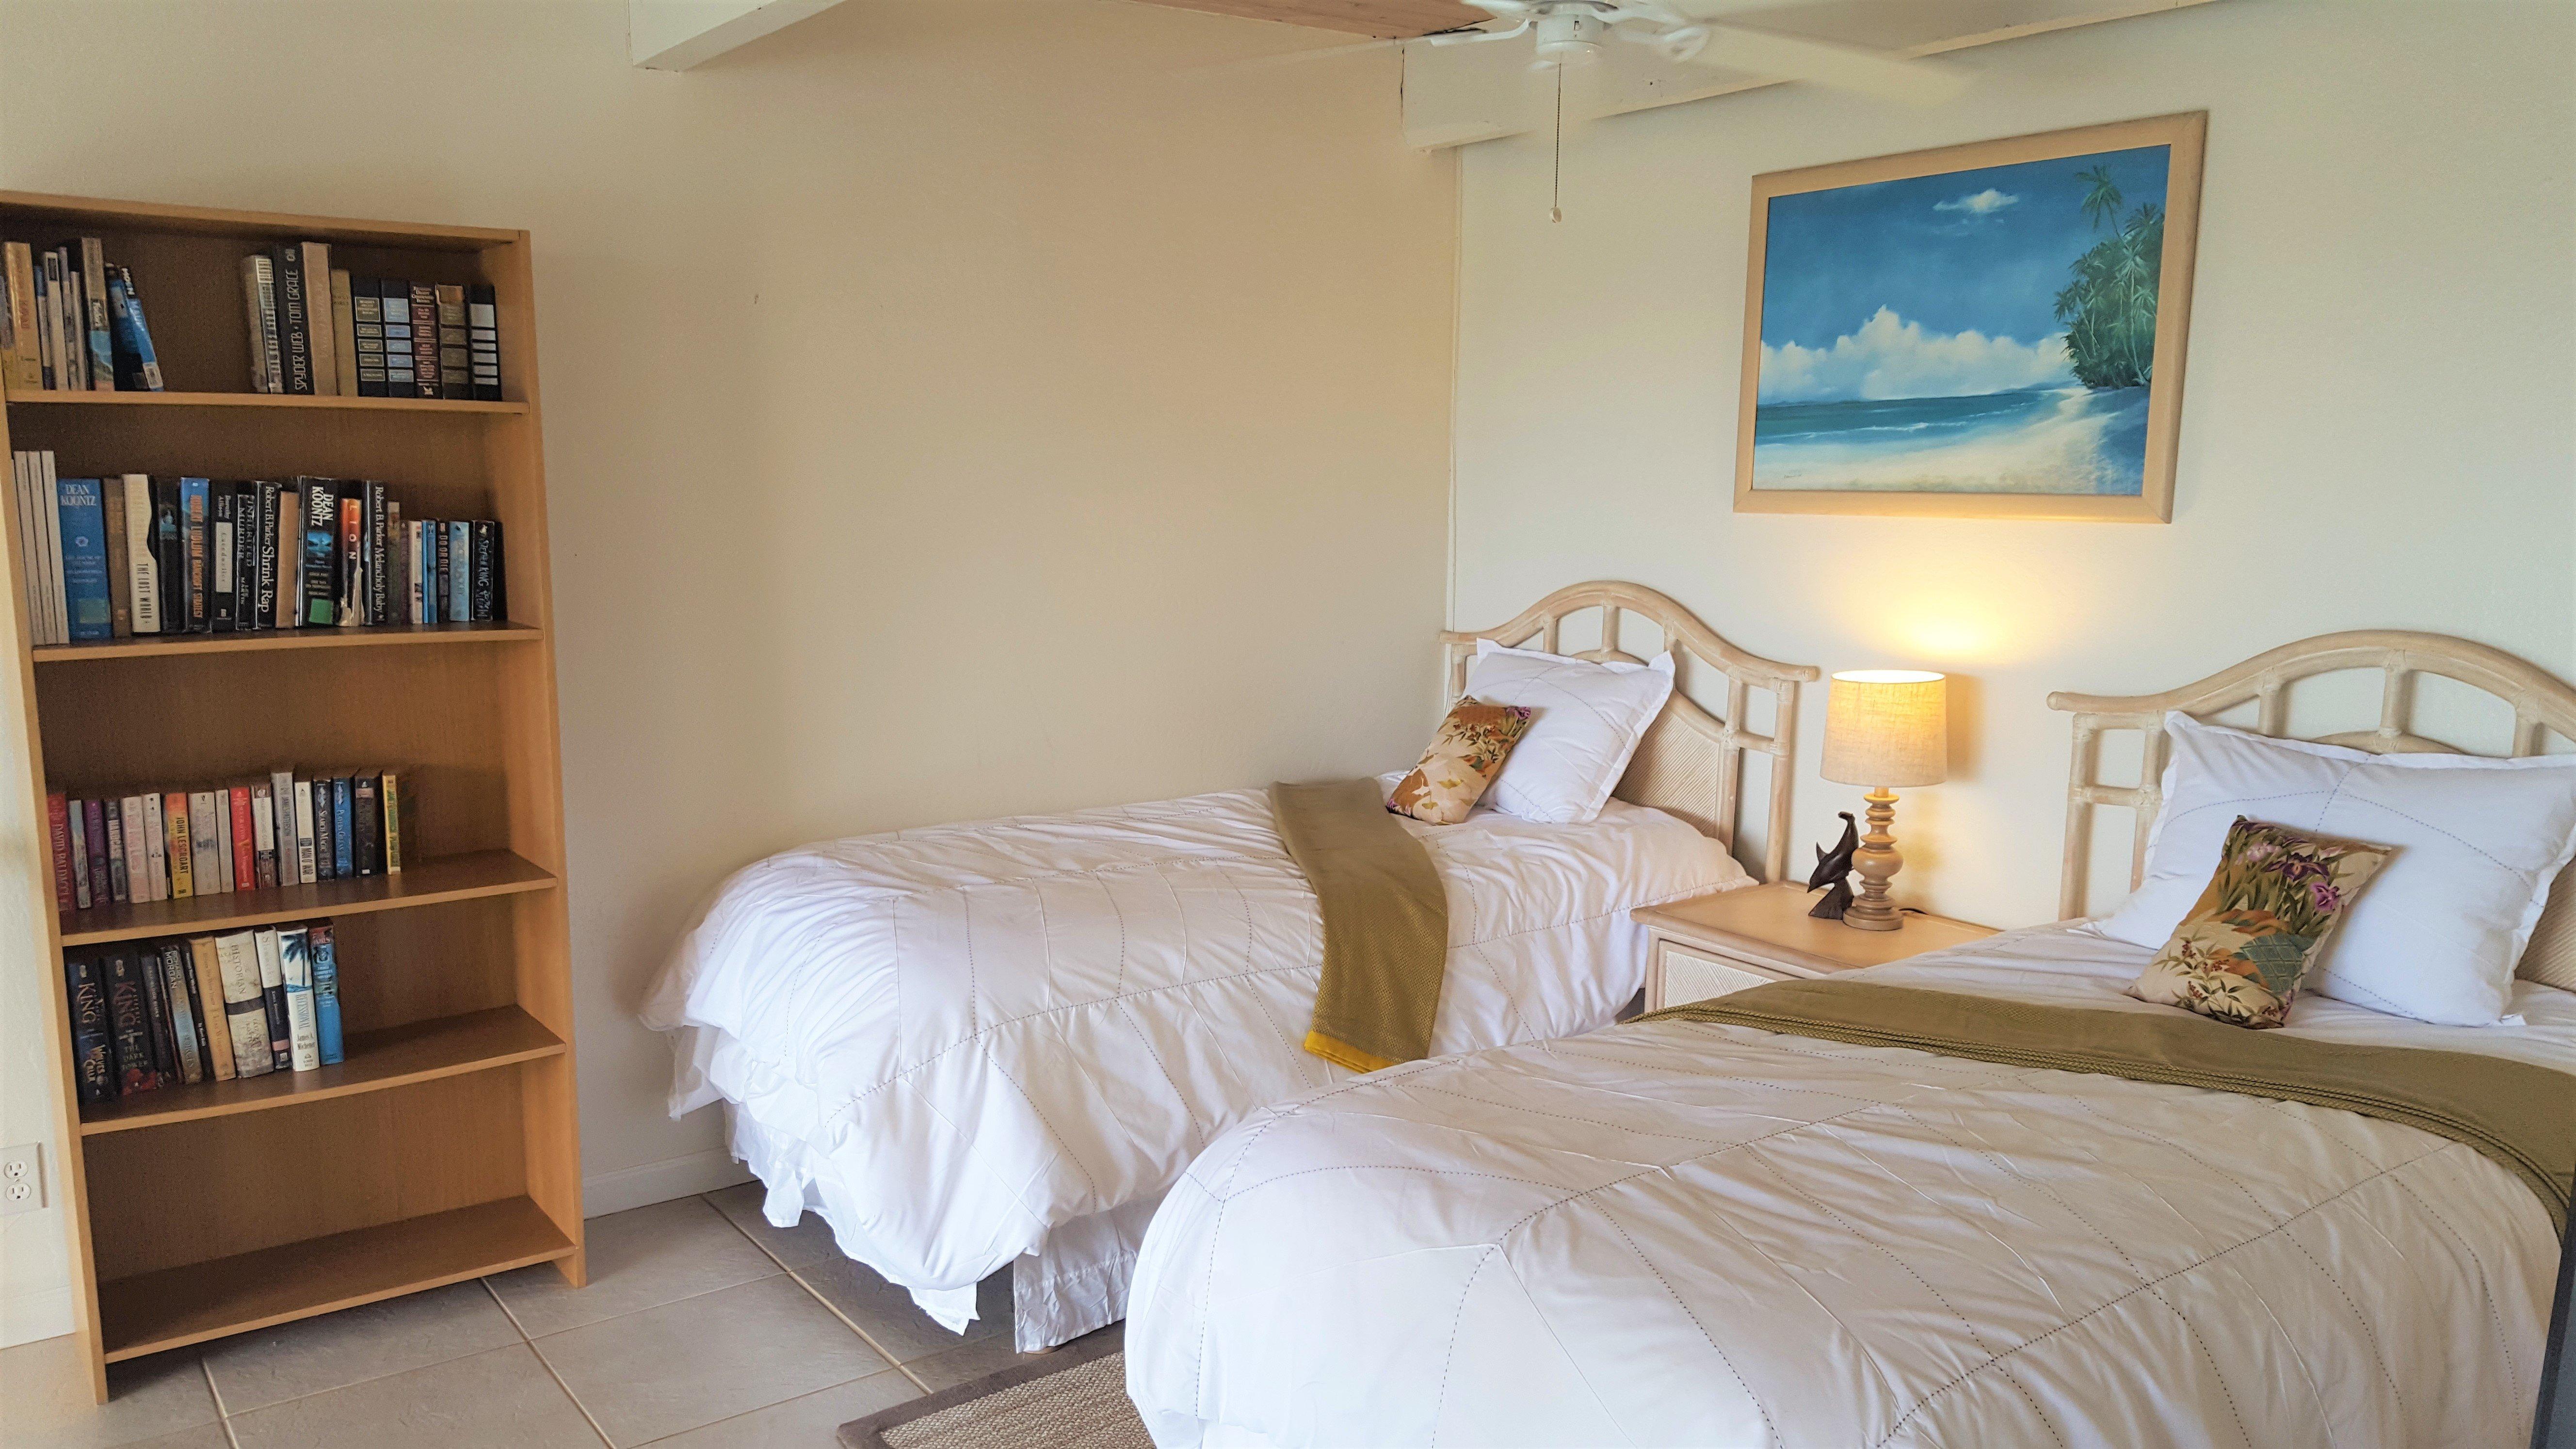 C25 Upstairs bedroom